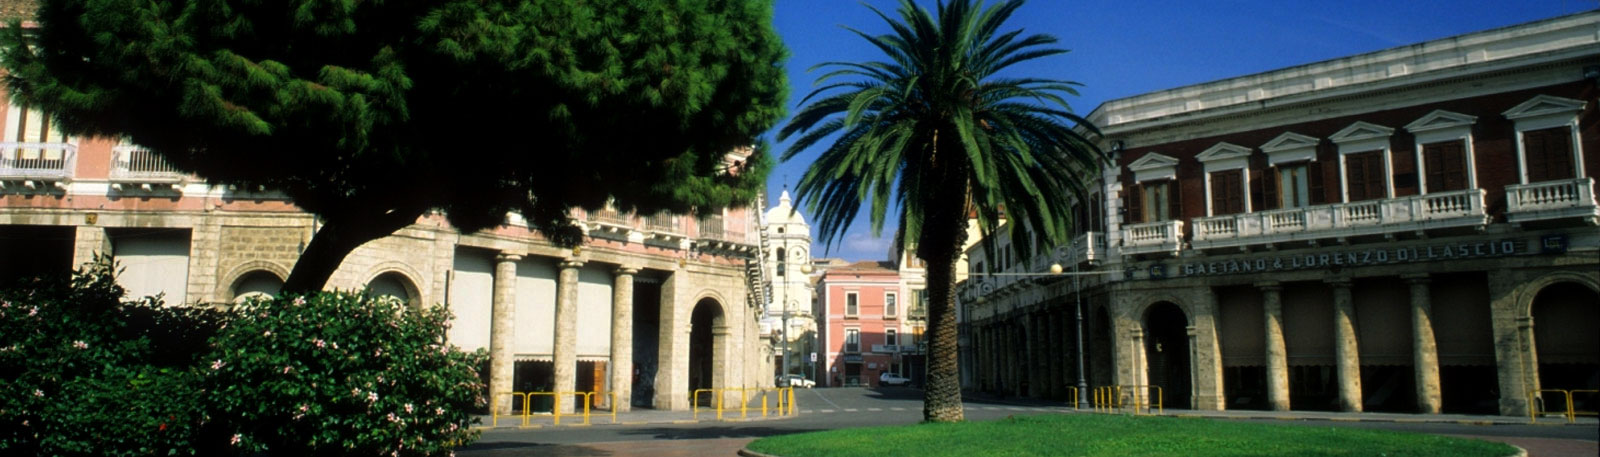 piazza-pitagora